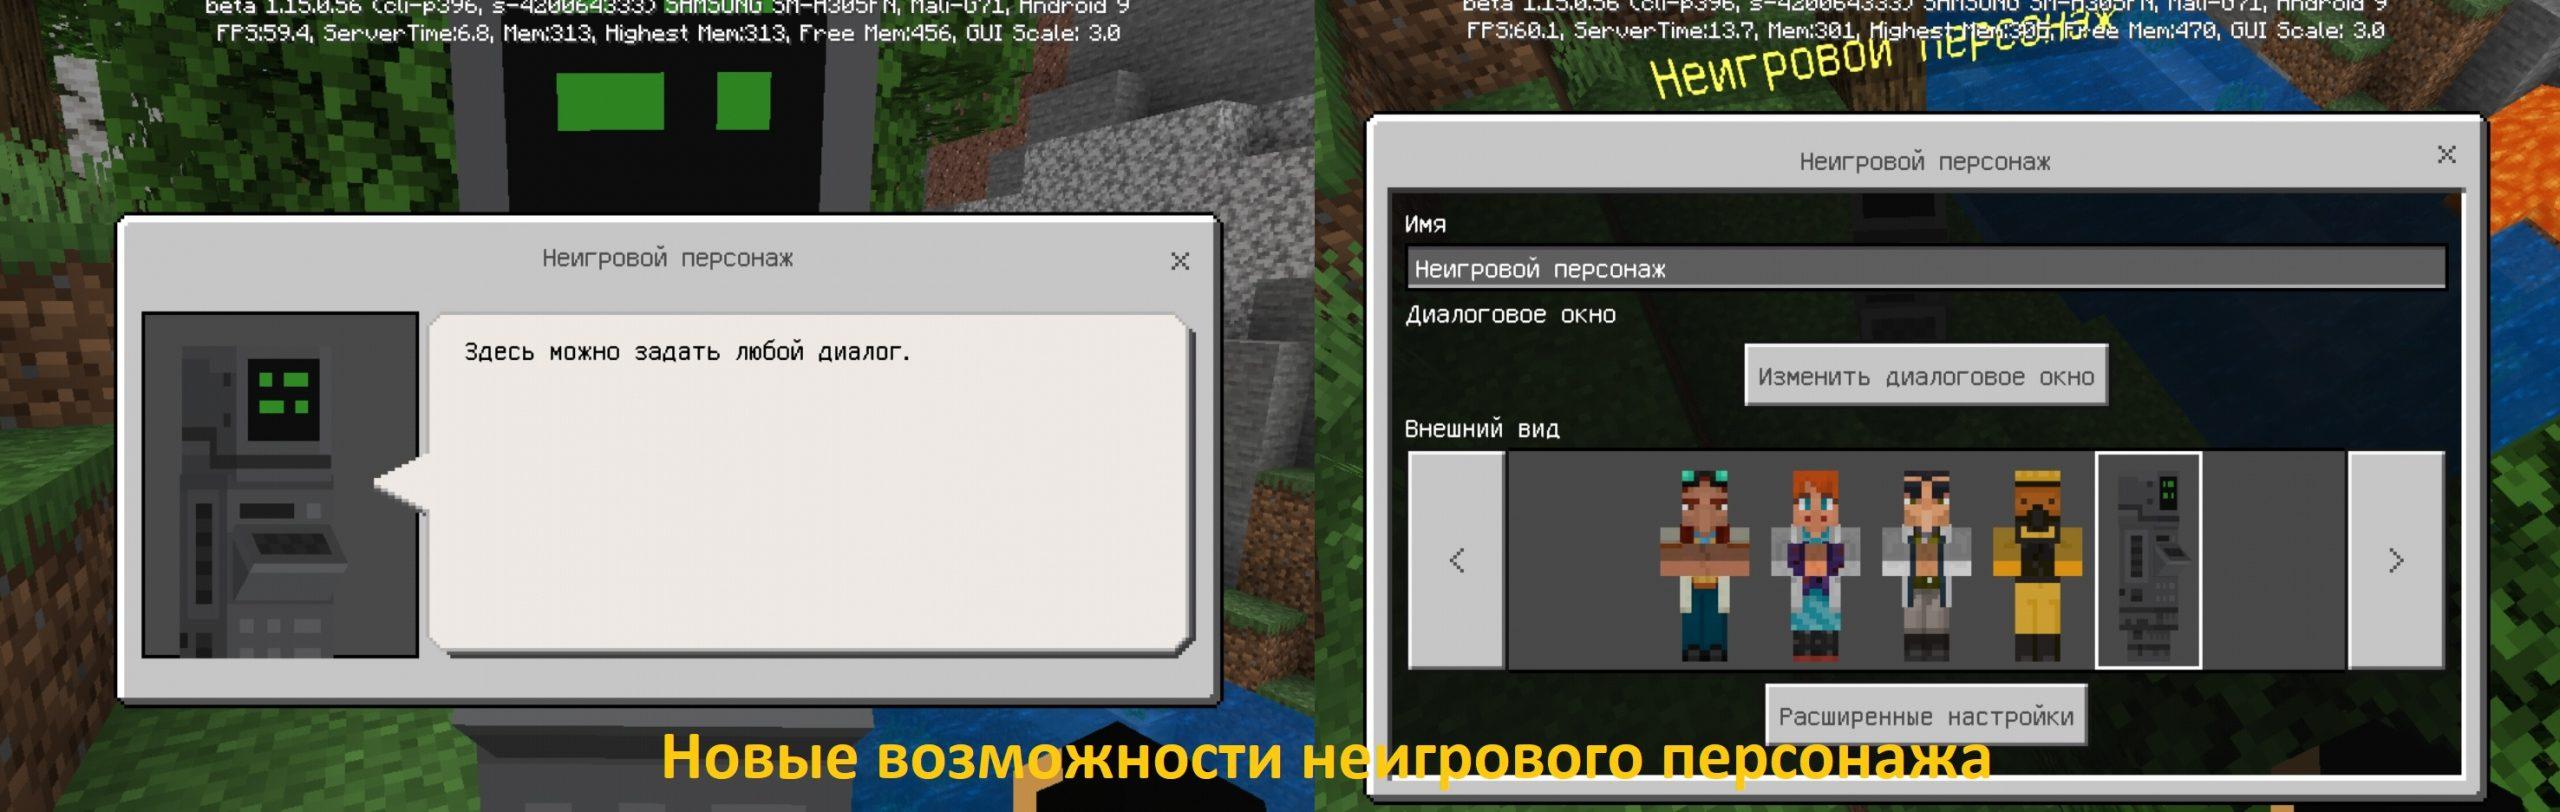 Мобы в Майнкрафт 1.15